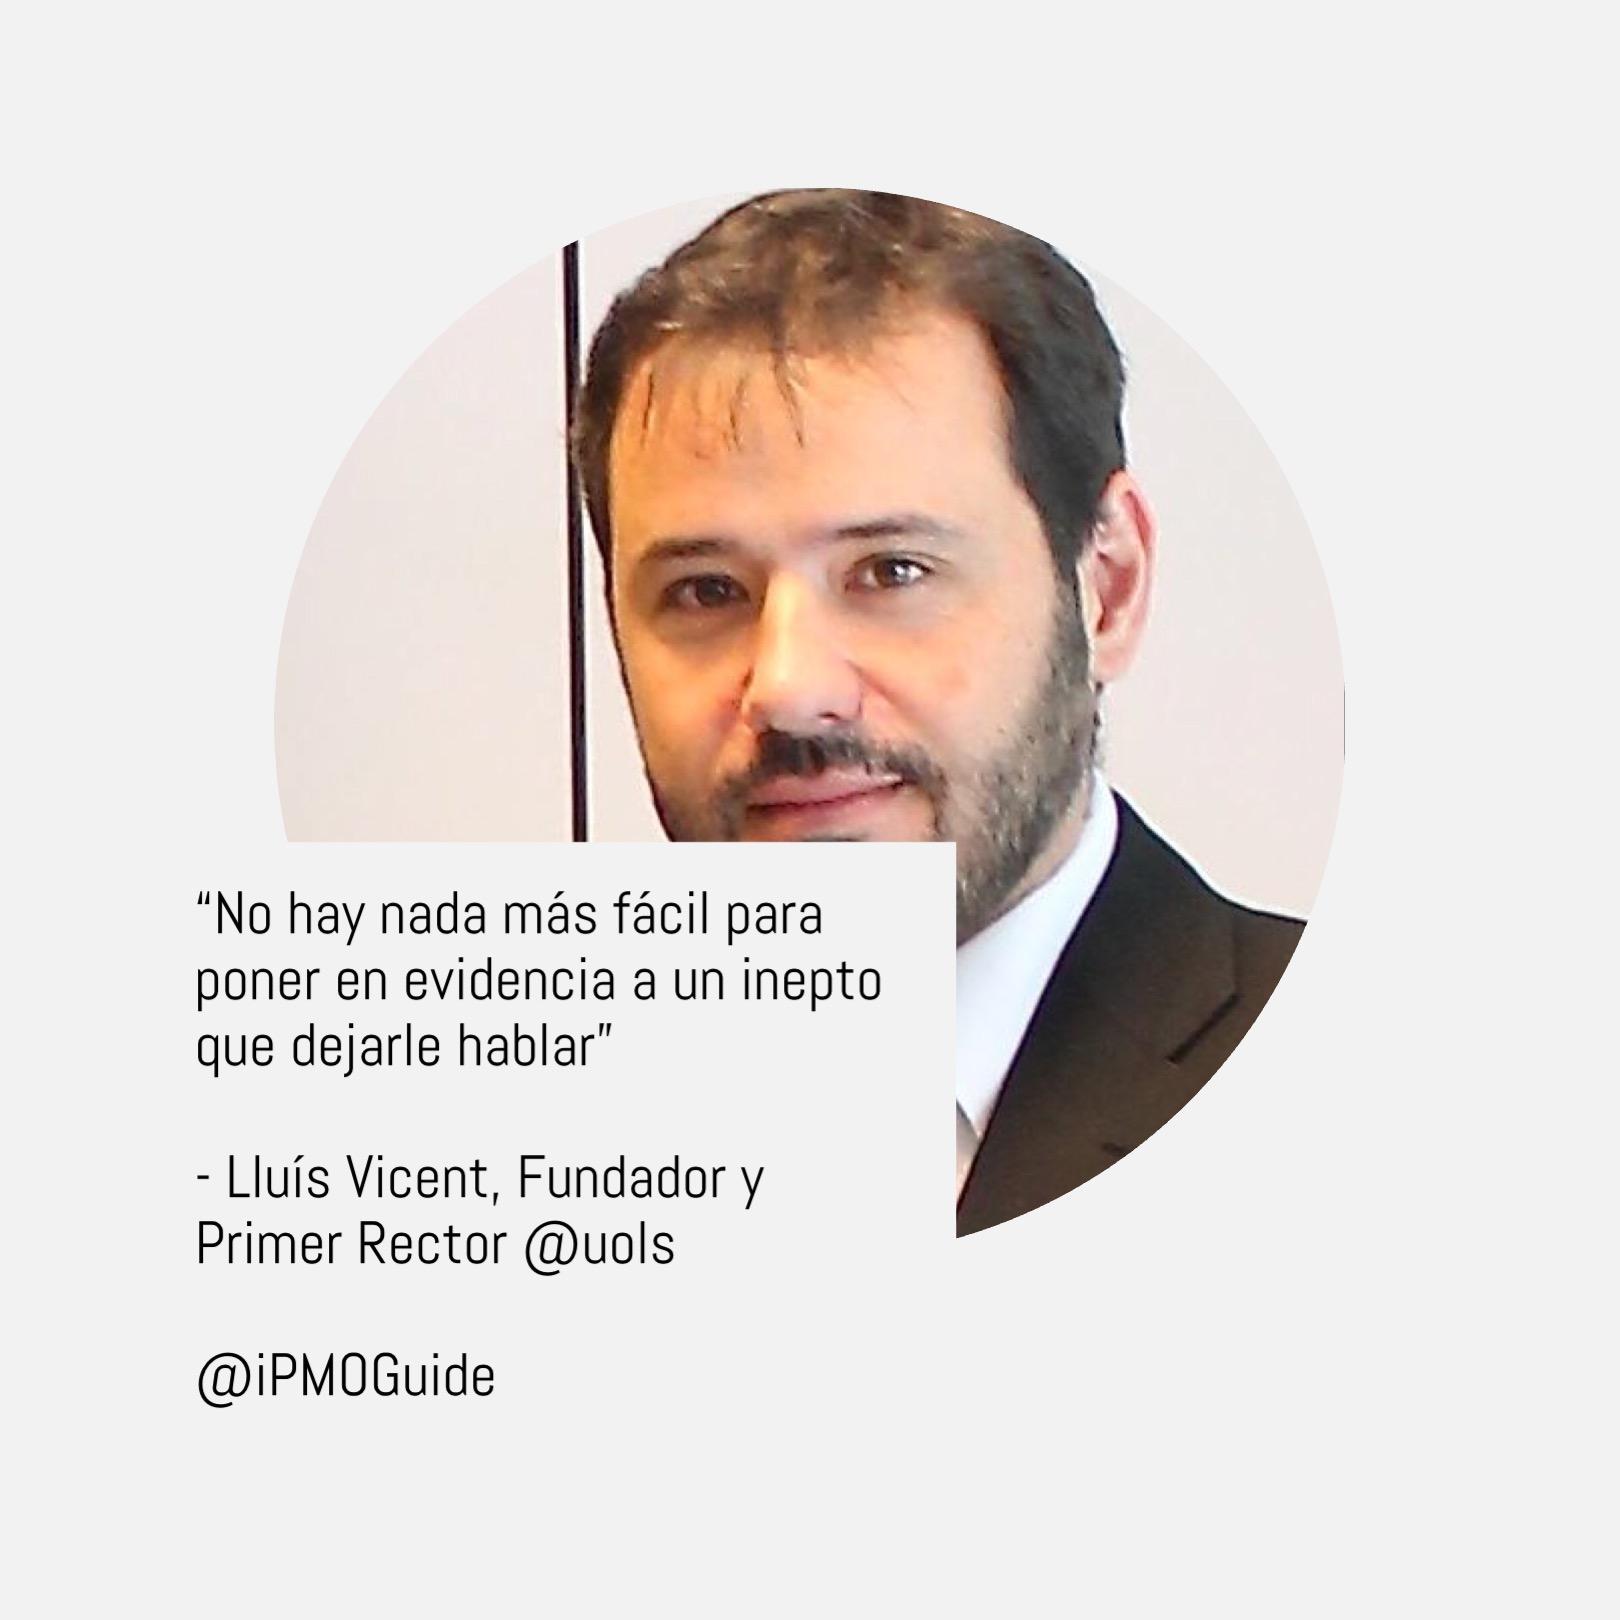 Luis Vicent